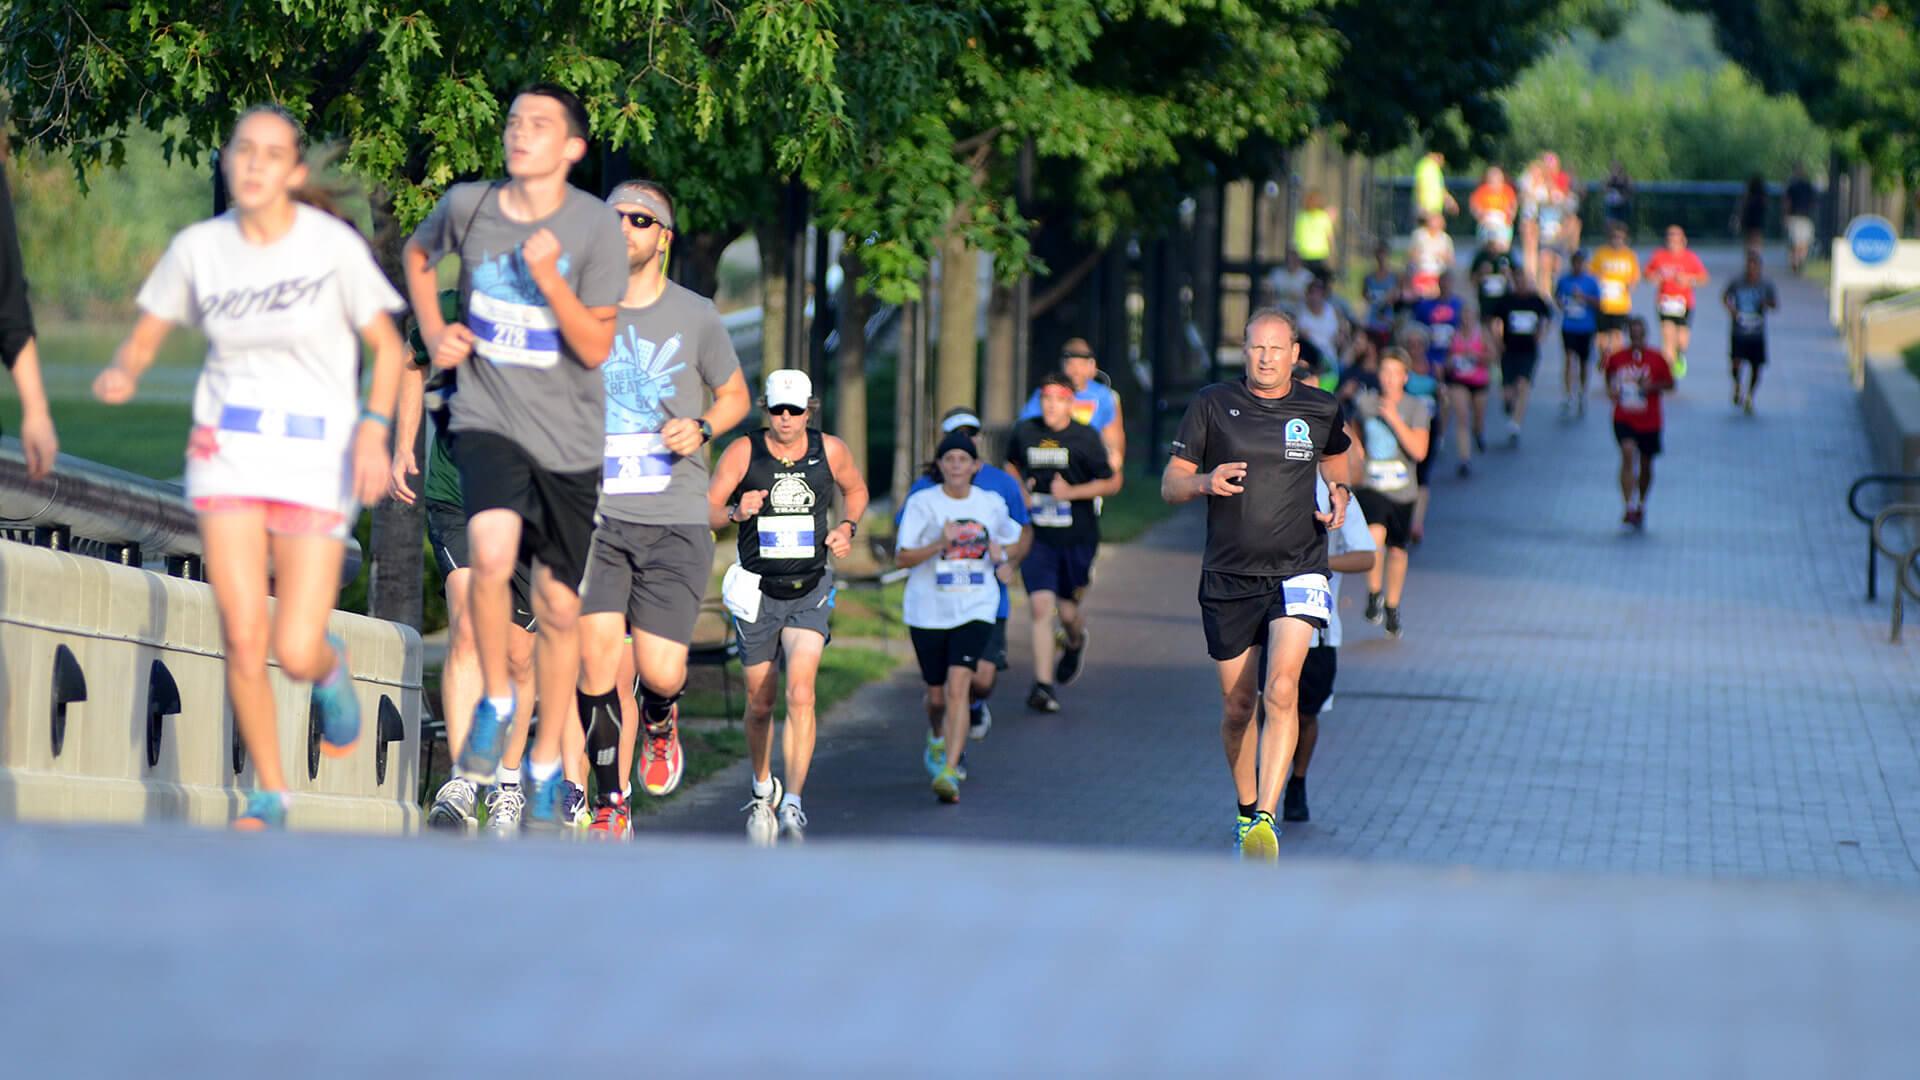 Street Beat 5K run/walk returns to World Championship festivities